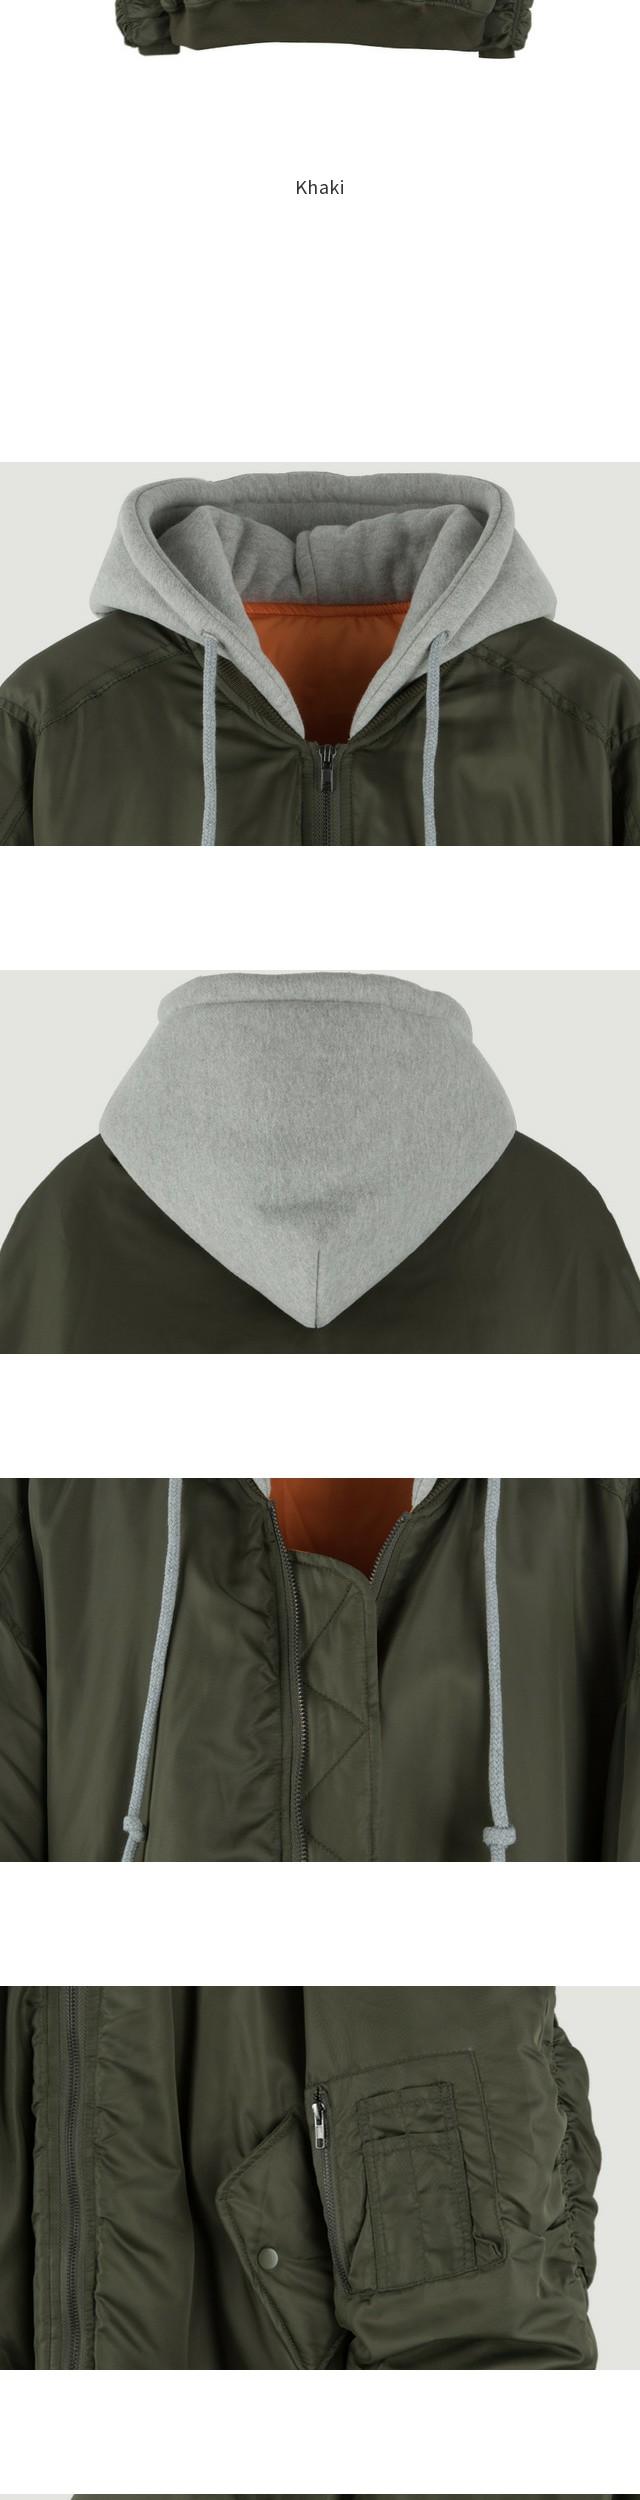 Under dog hood jumper